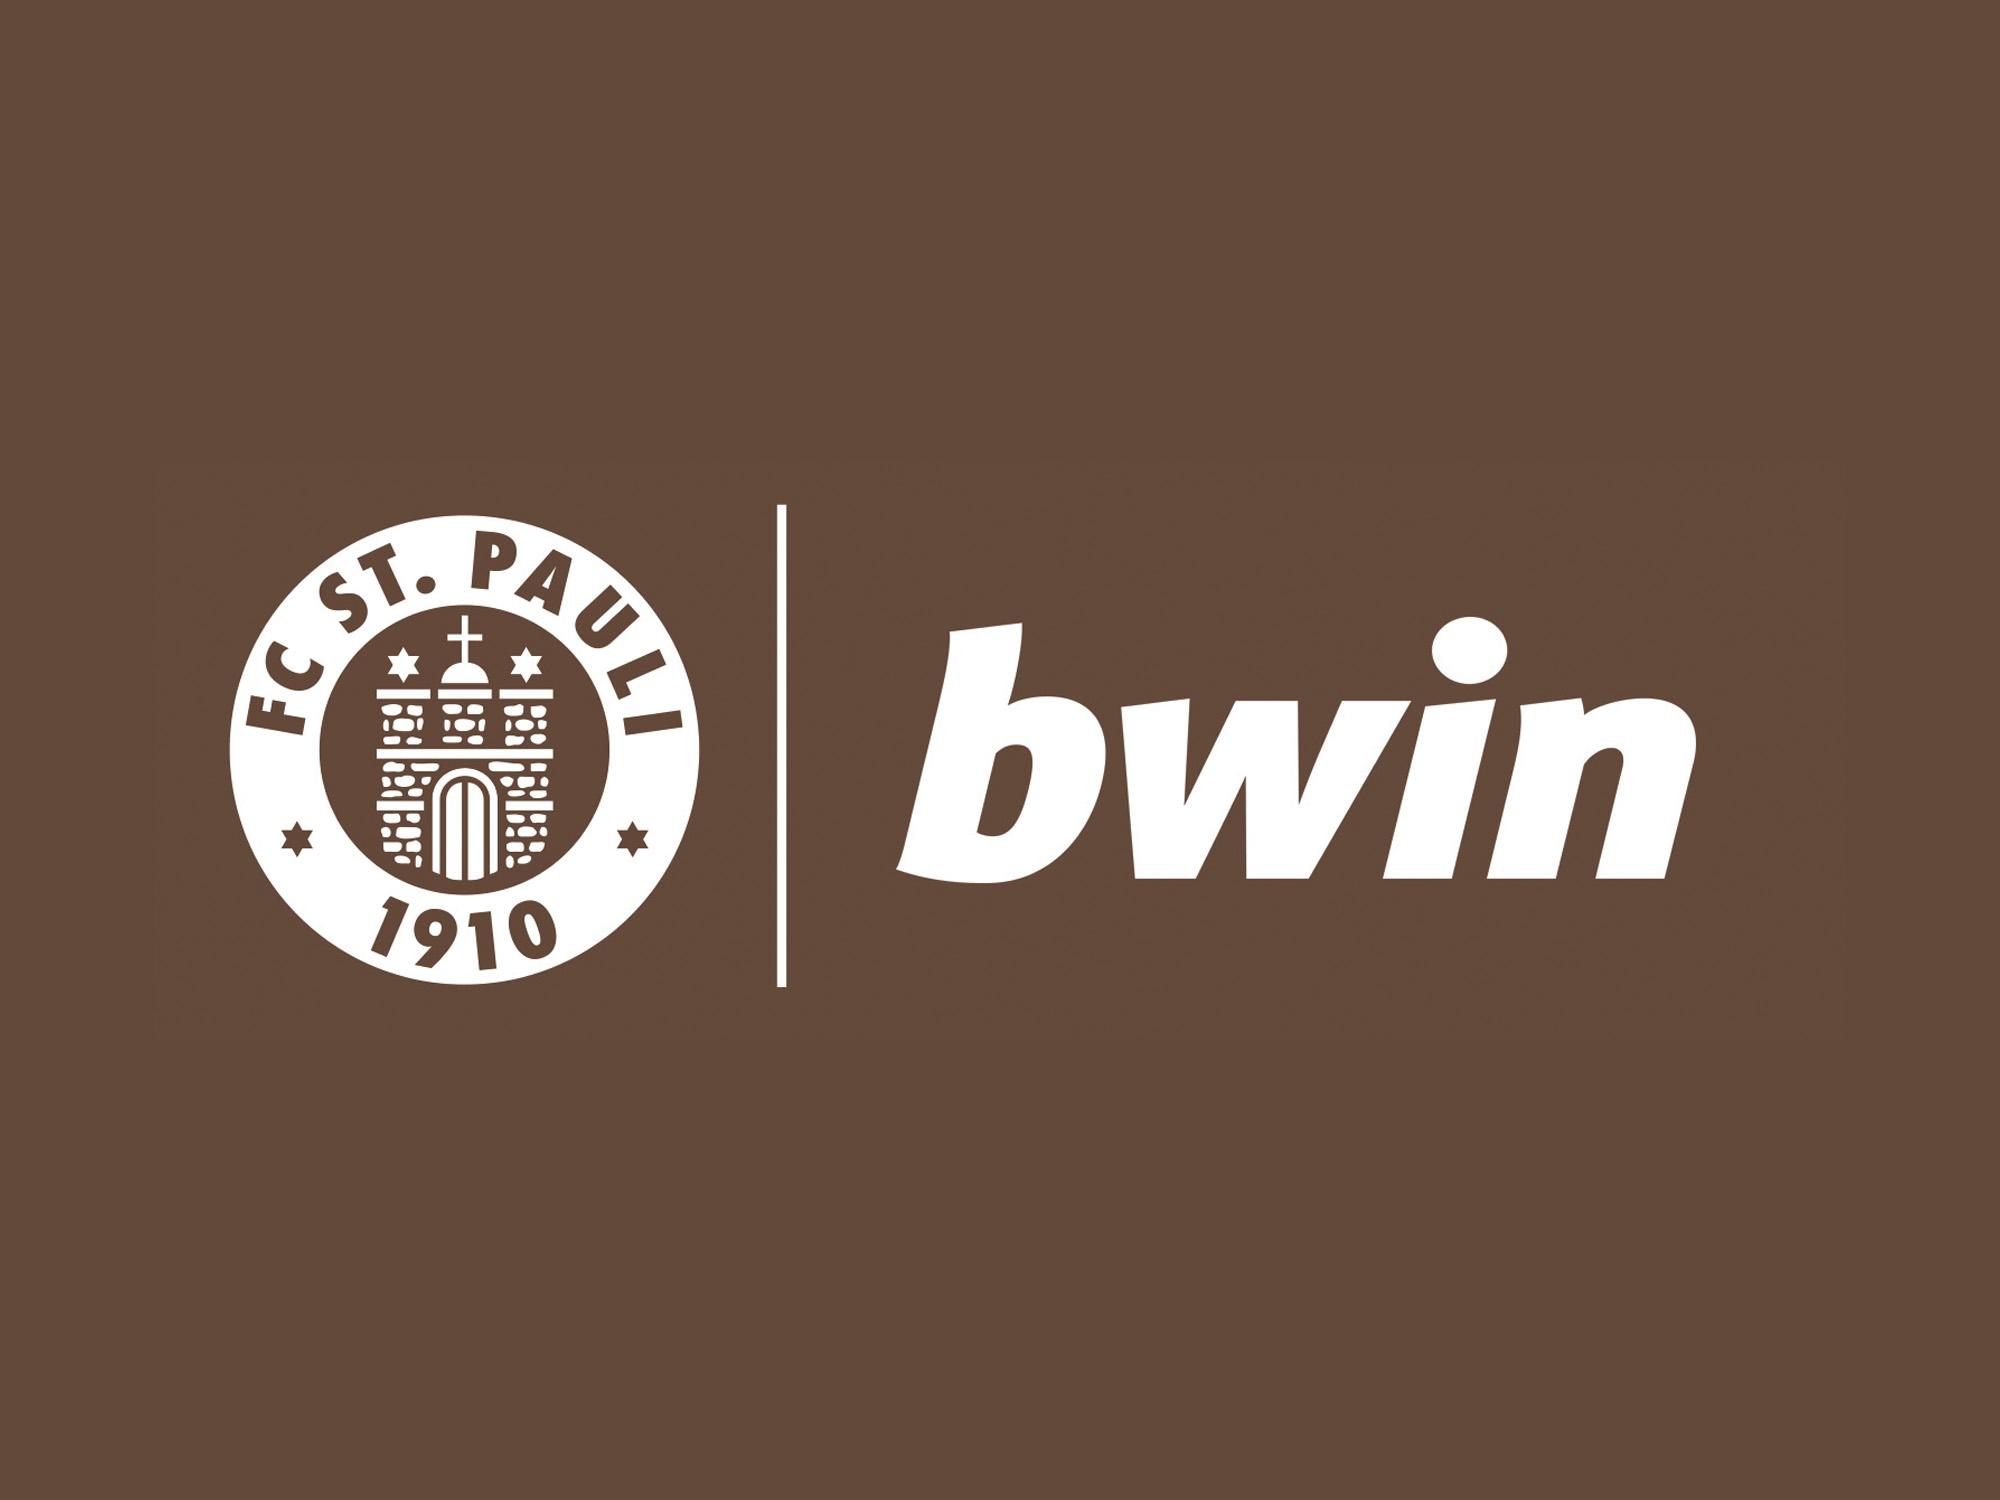 bwin neuer Partner des FC St. Pauli